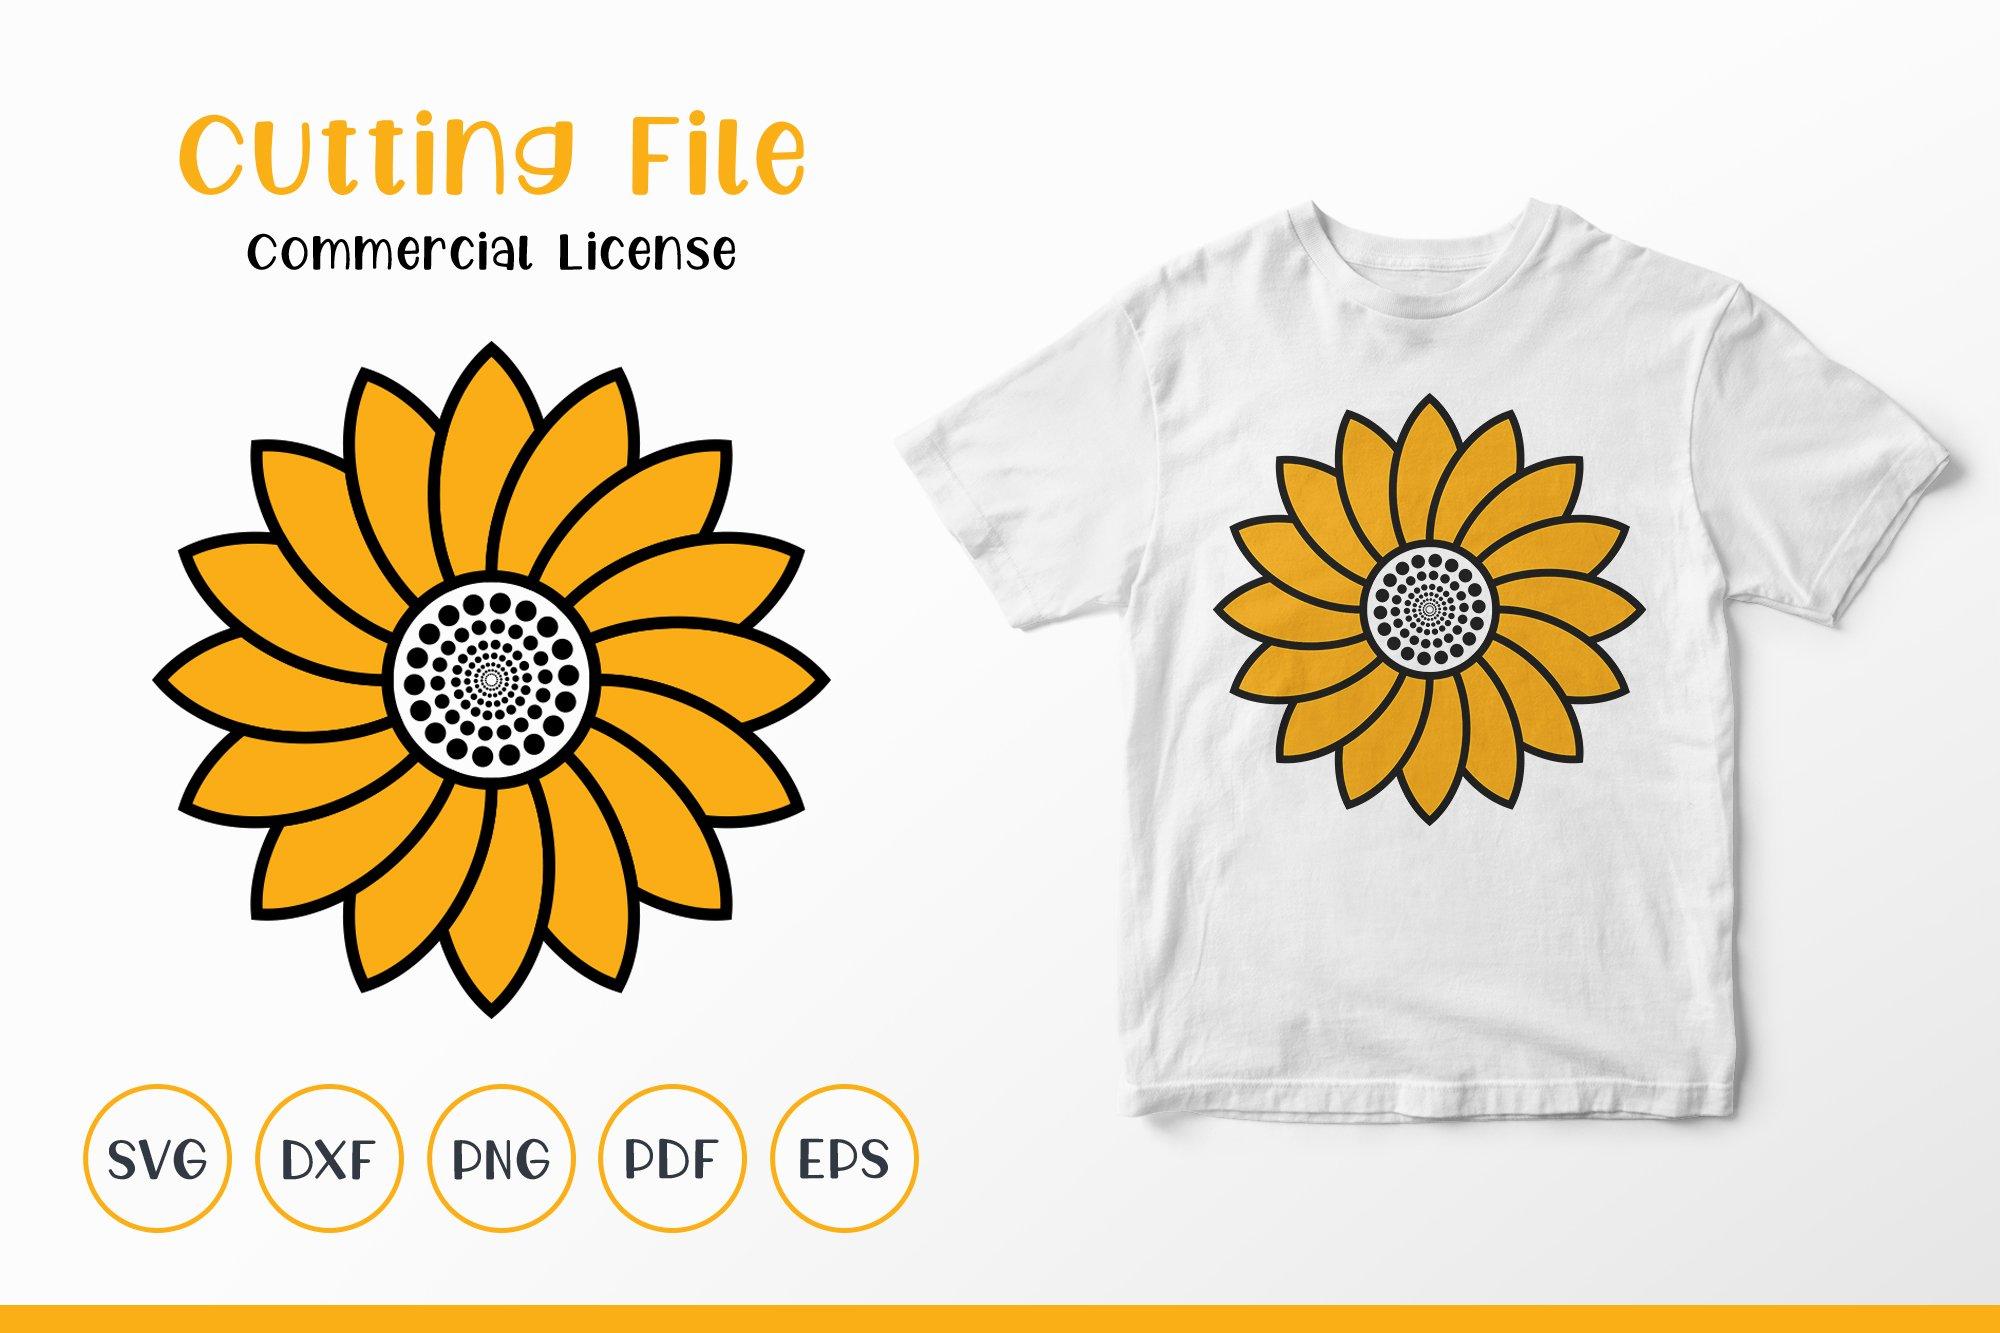 Sunflower SVG, Sunflower Clipart, Sunflower Monogram SVG example image 1